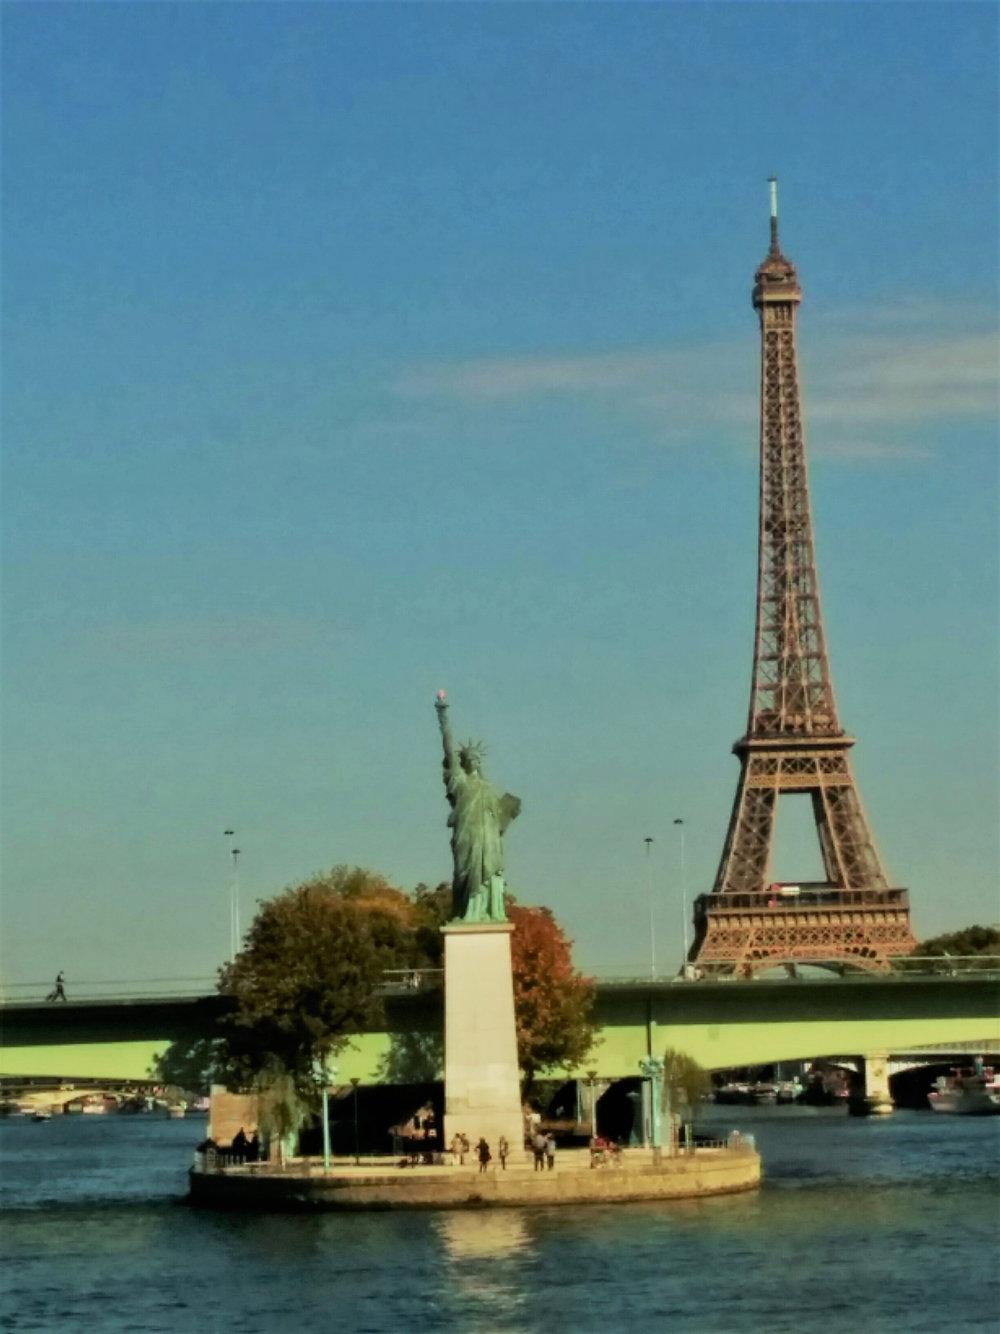 statue-of-liberty-eiffel-tower.jpg